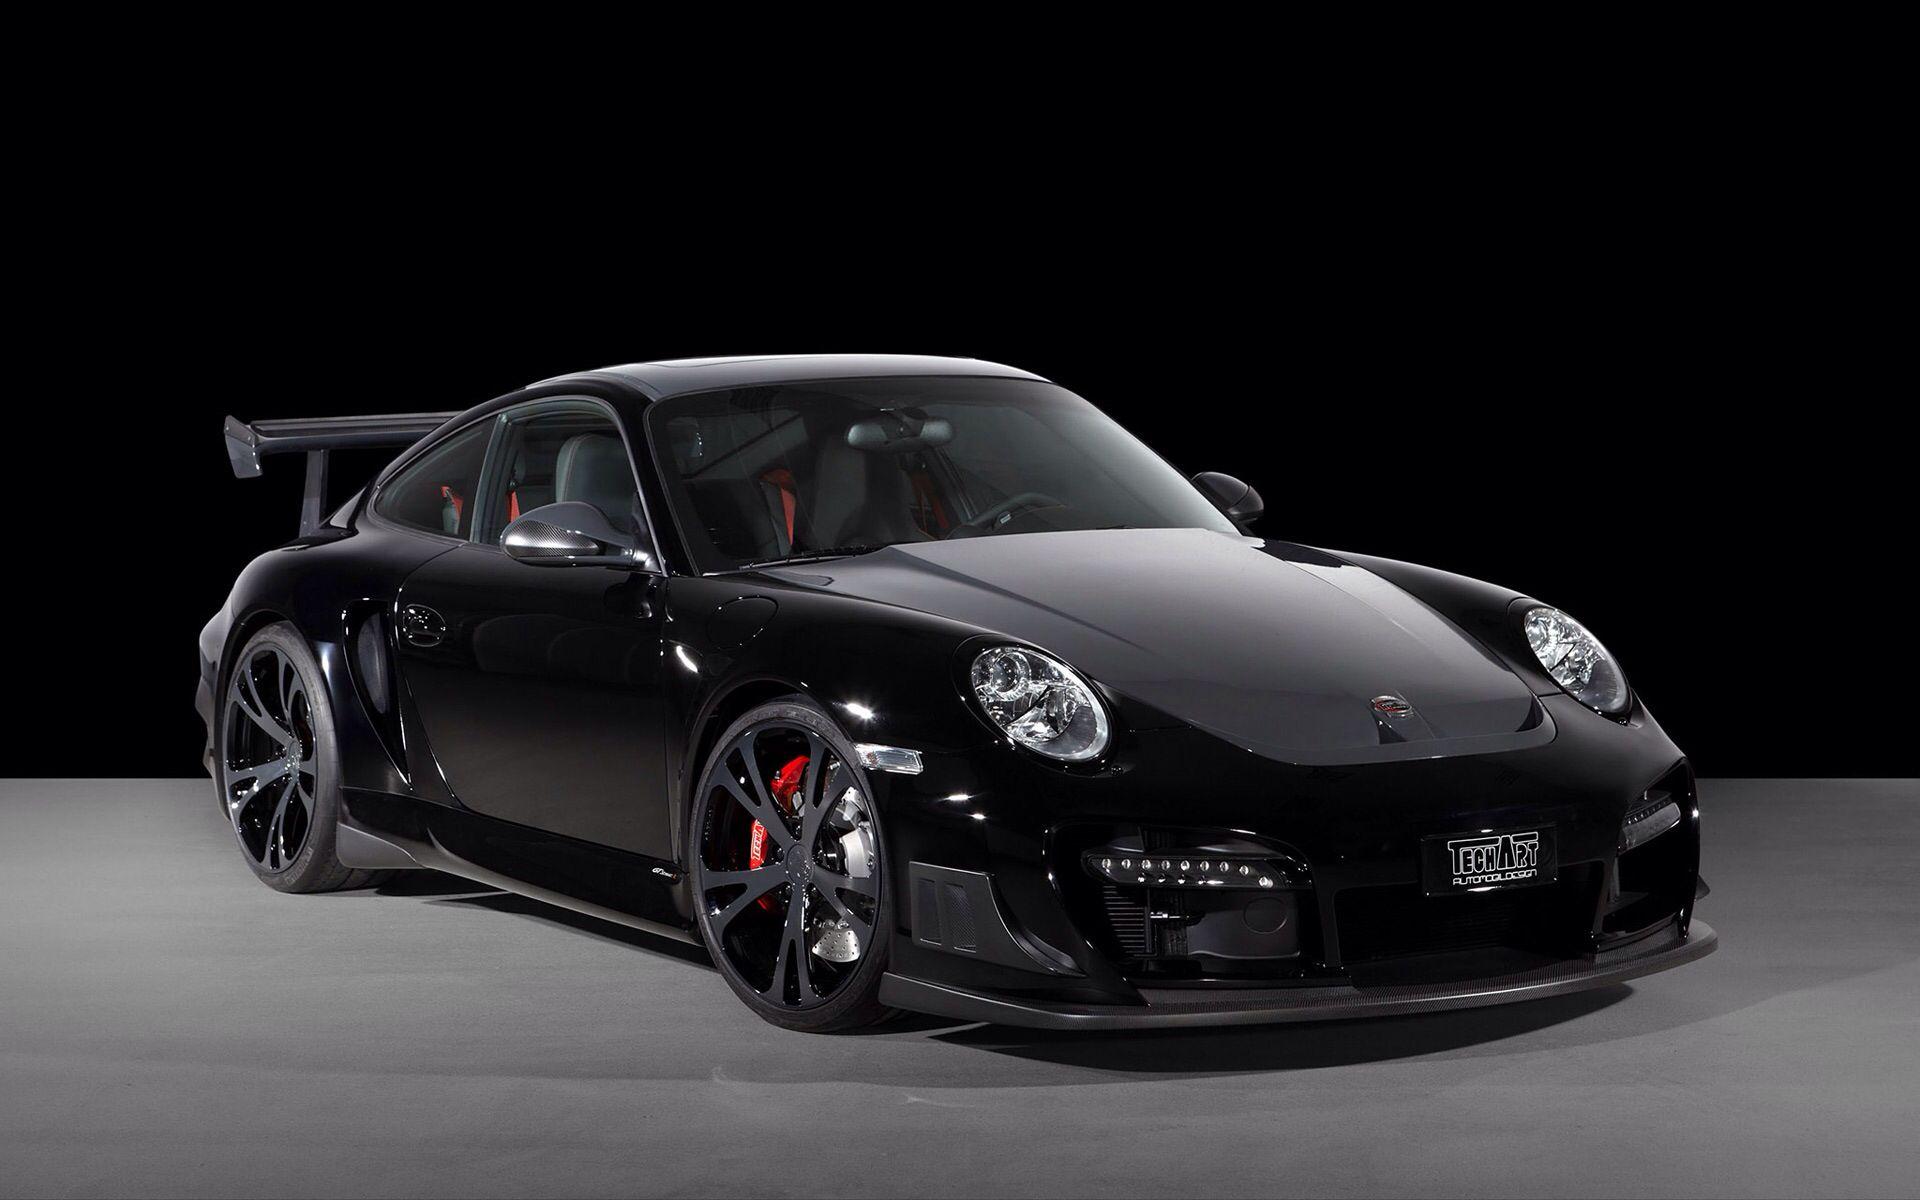 d728df901c20a803995bace9bacc41ea Outstanding Porsche 911 Gt2 Hot Wheels Cars Trend